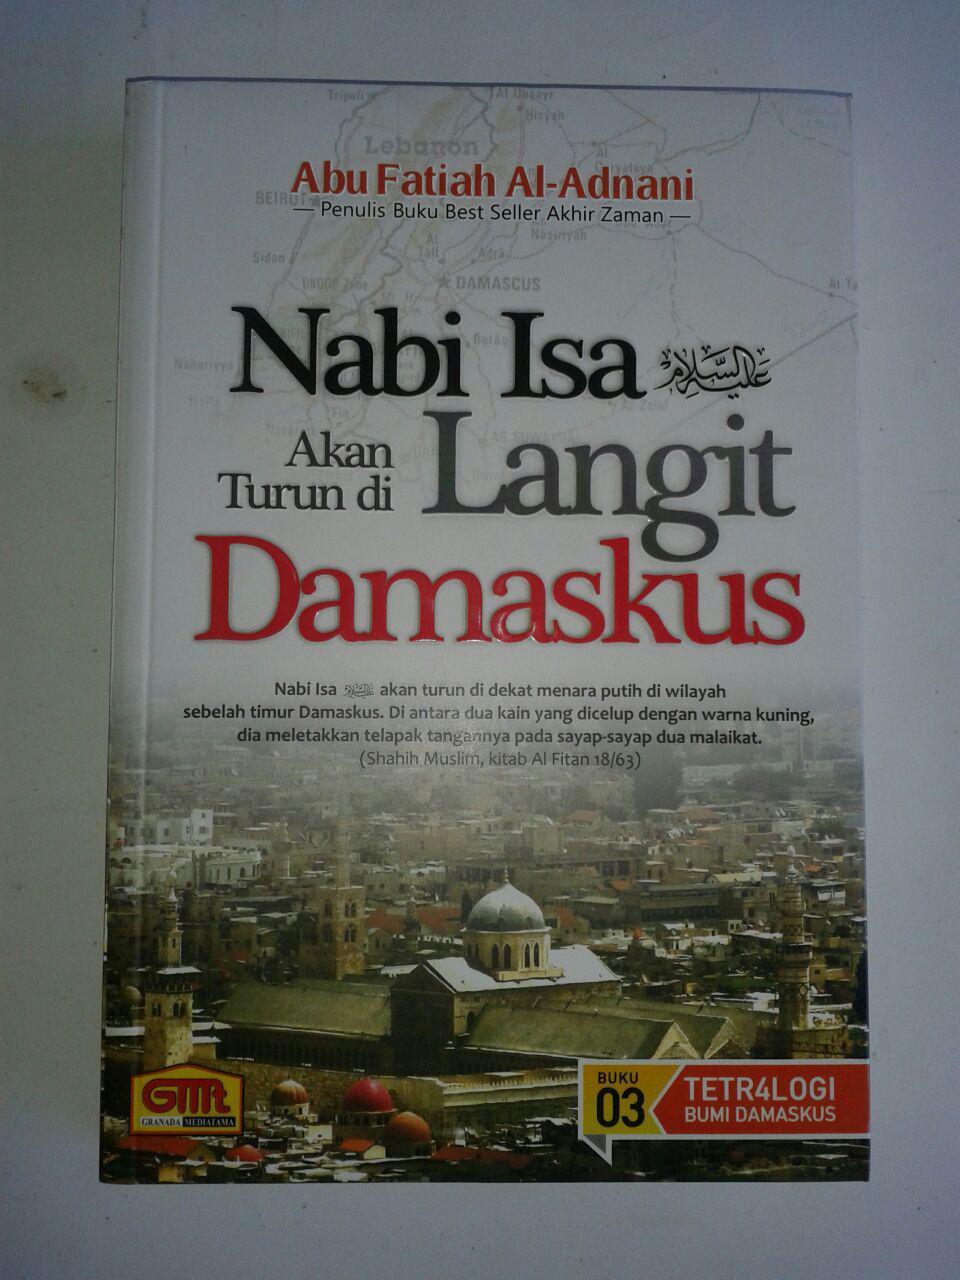 Buku Nabi Isa Akan Turun Di Langit Damaskus cover 2